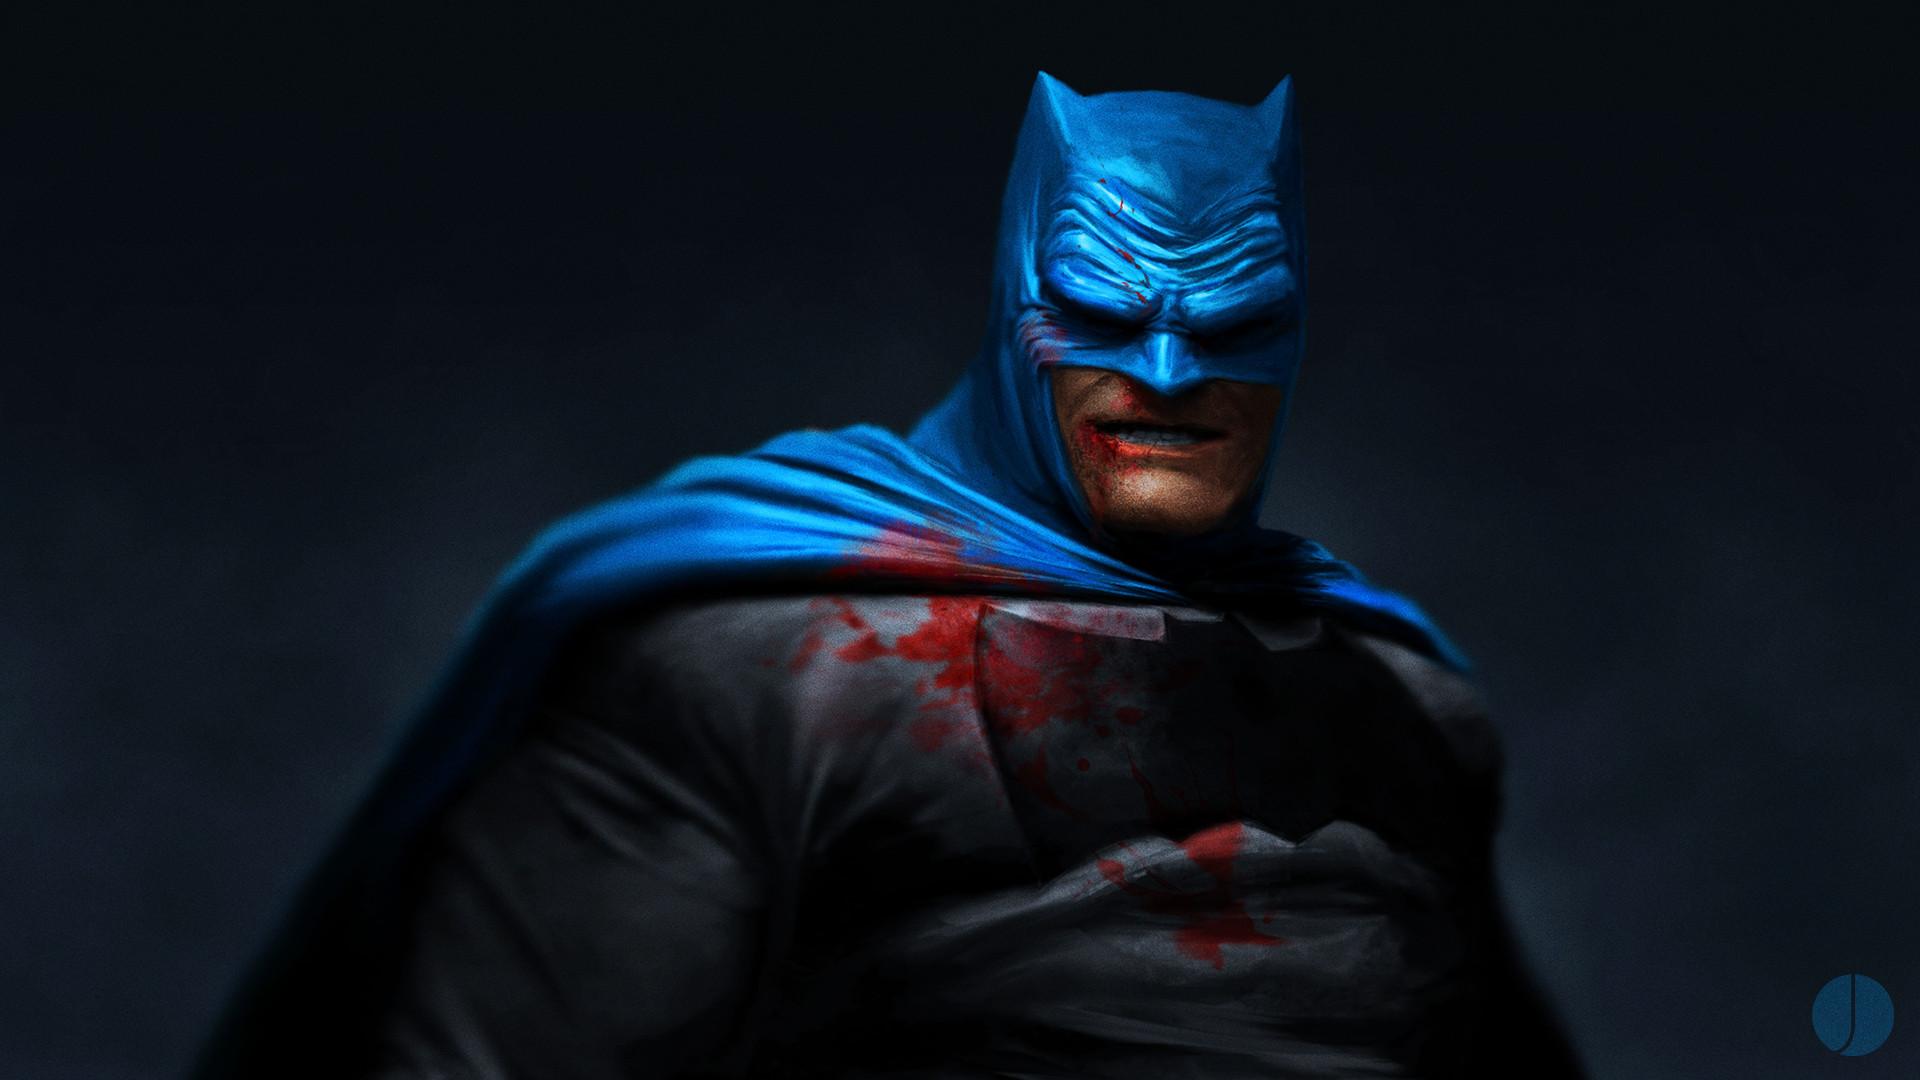 Batman Thiagoprovin Deviantart 1920x1080